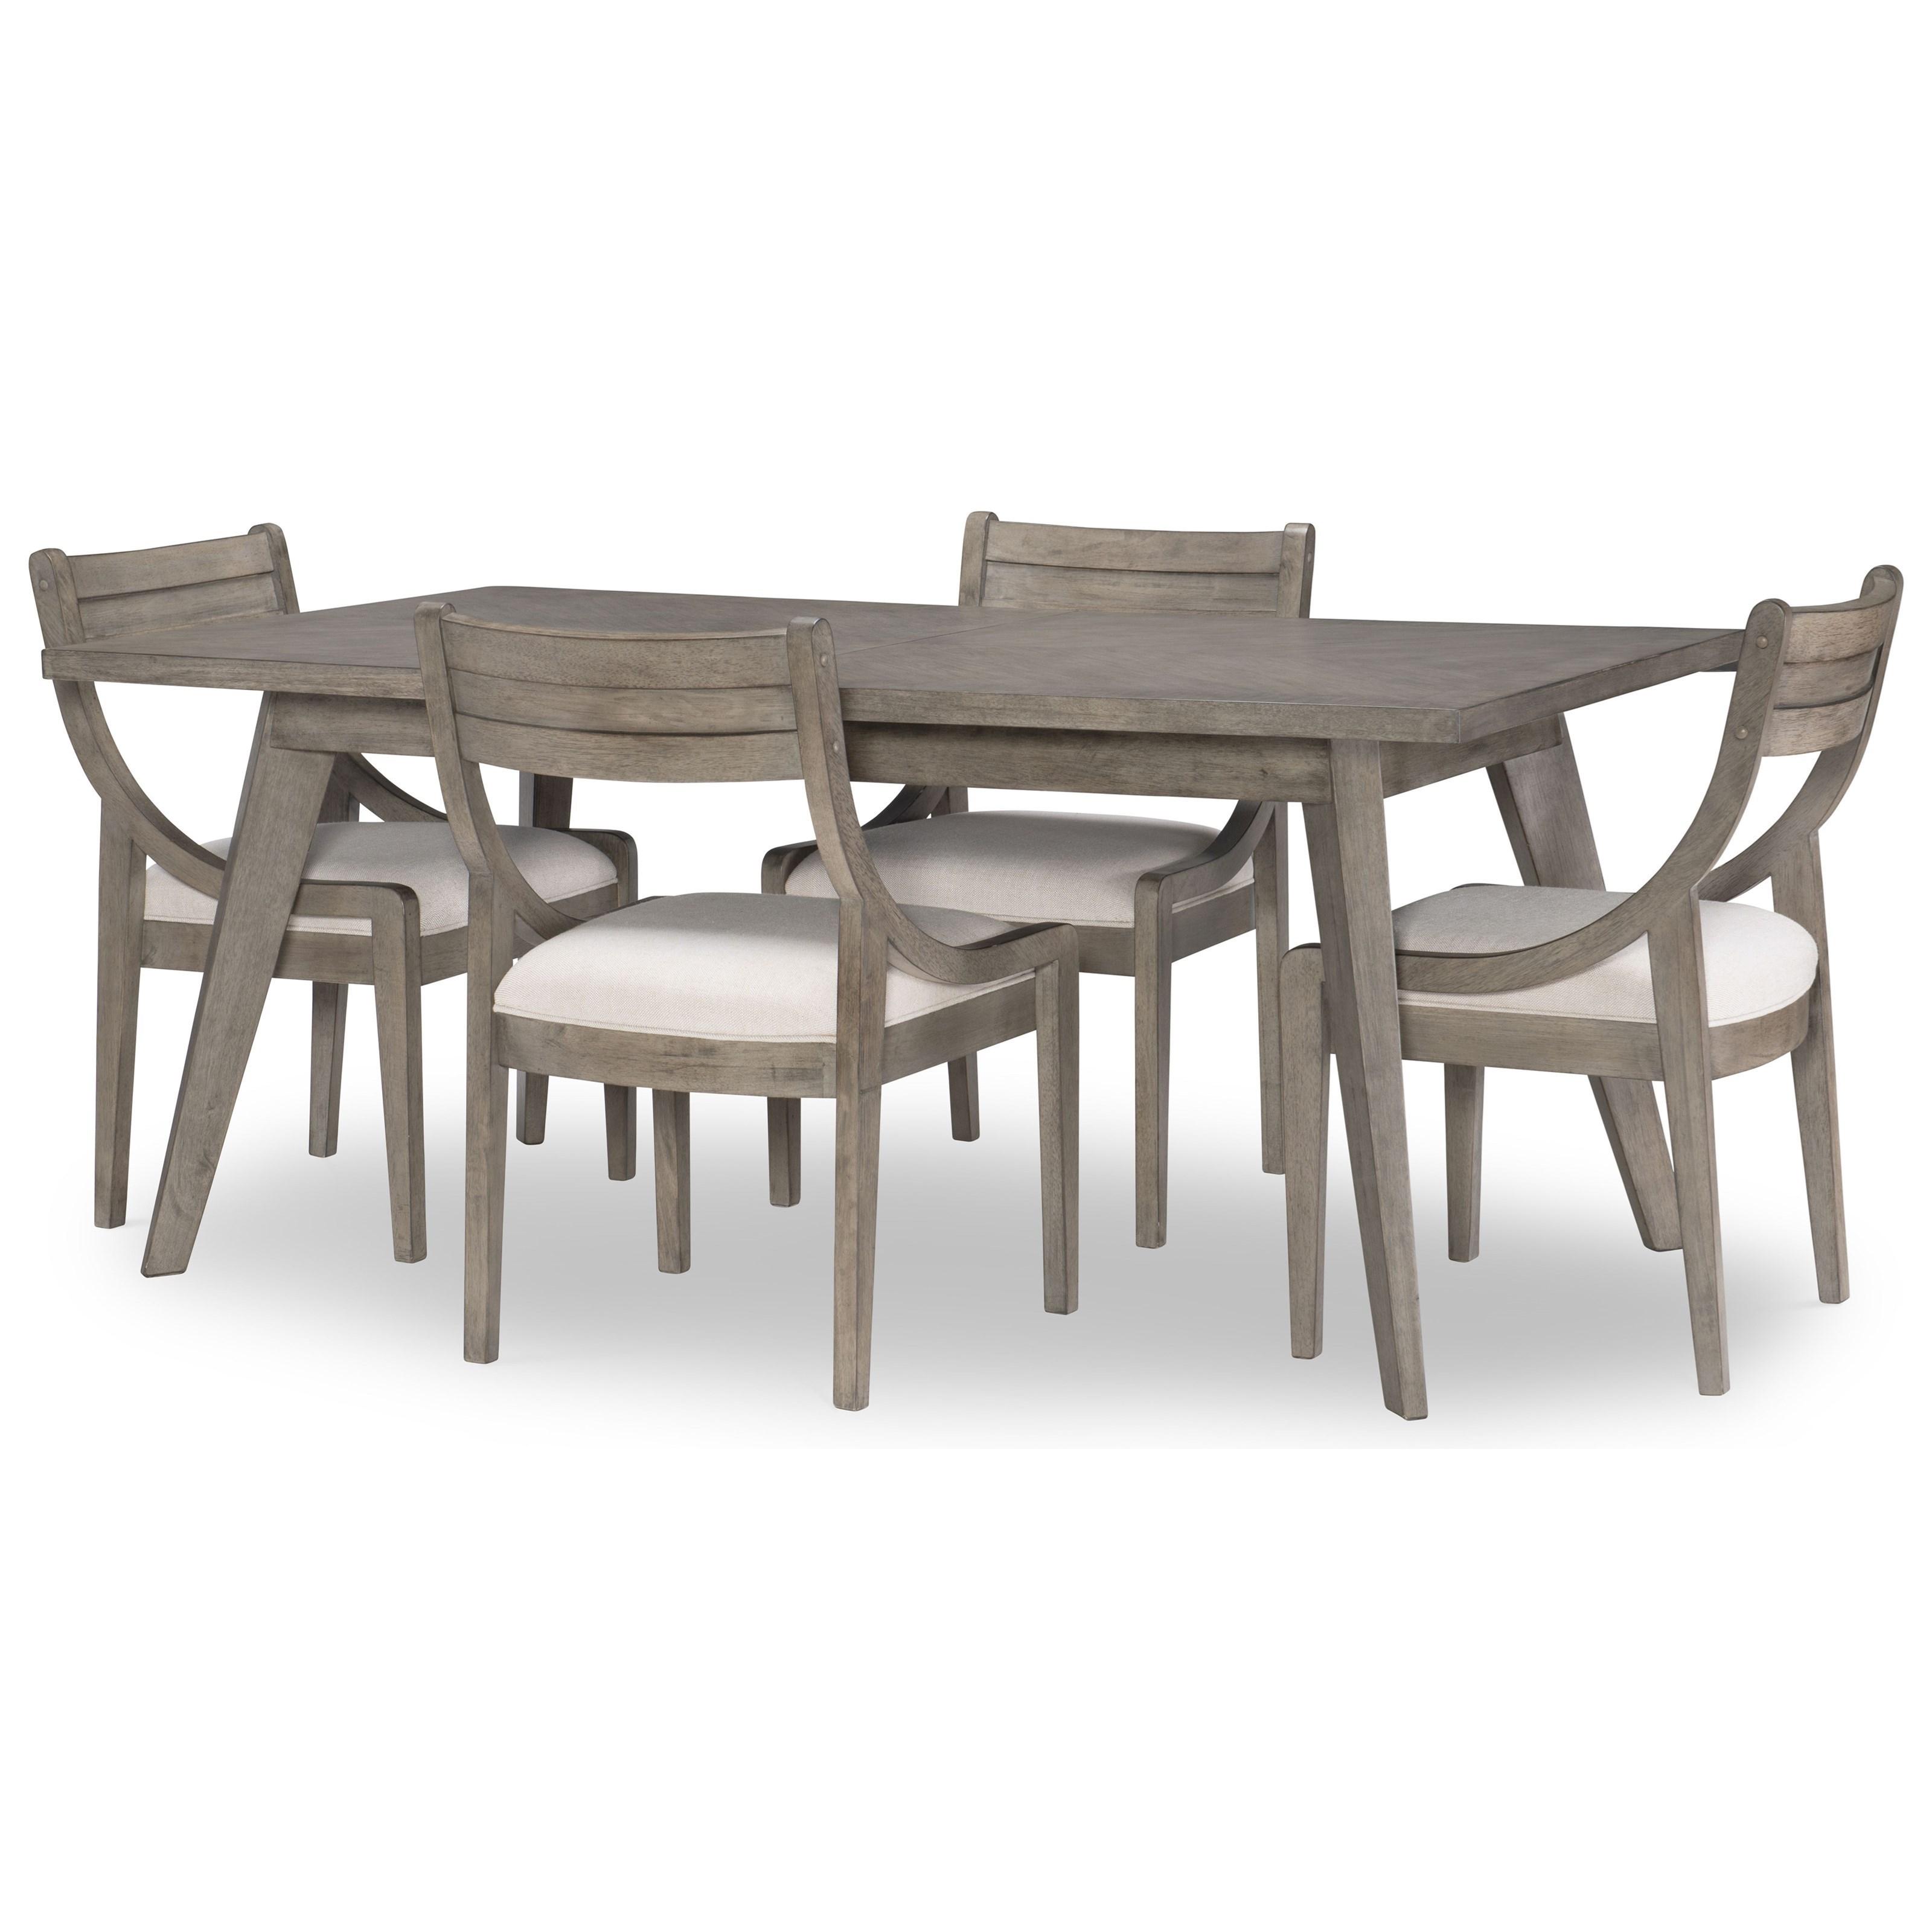 Greydale 5-Piece Dining Set